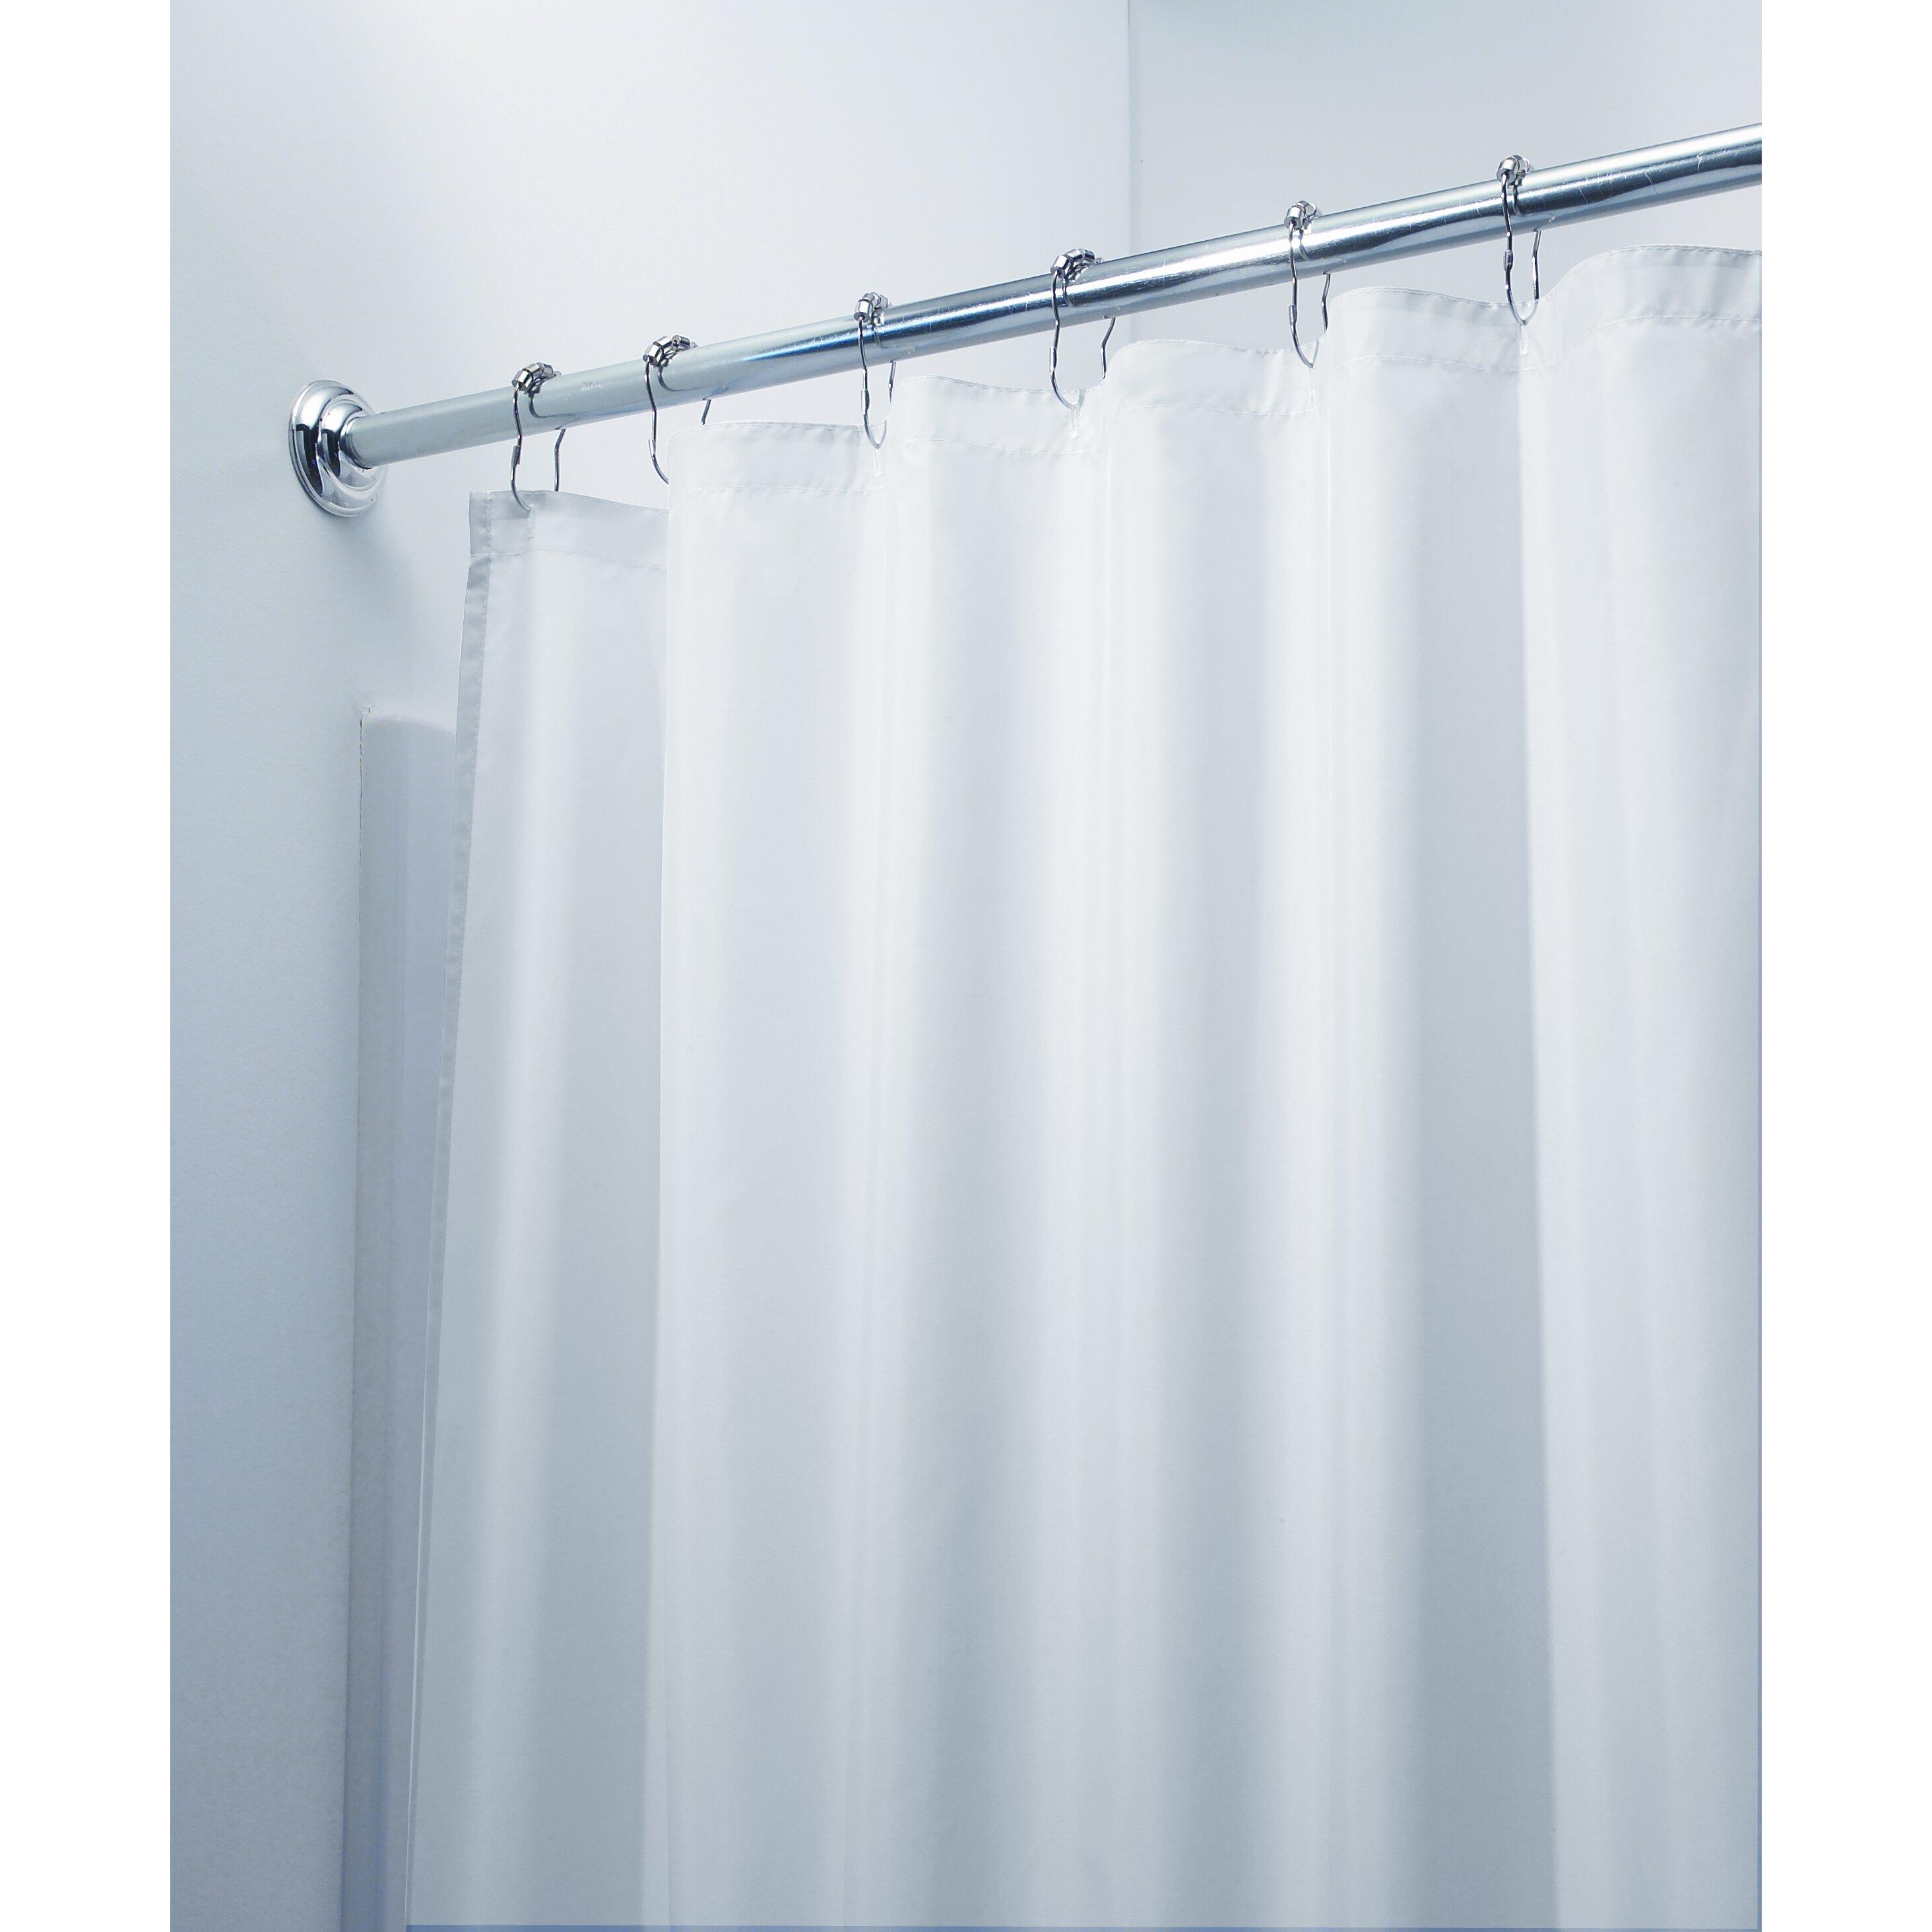 Symple Stuff Waterproof Stall Shower Curtain Reviews Wayfair